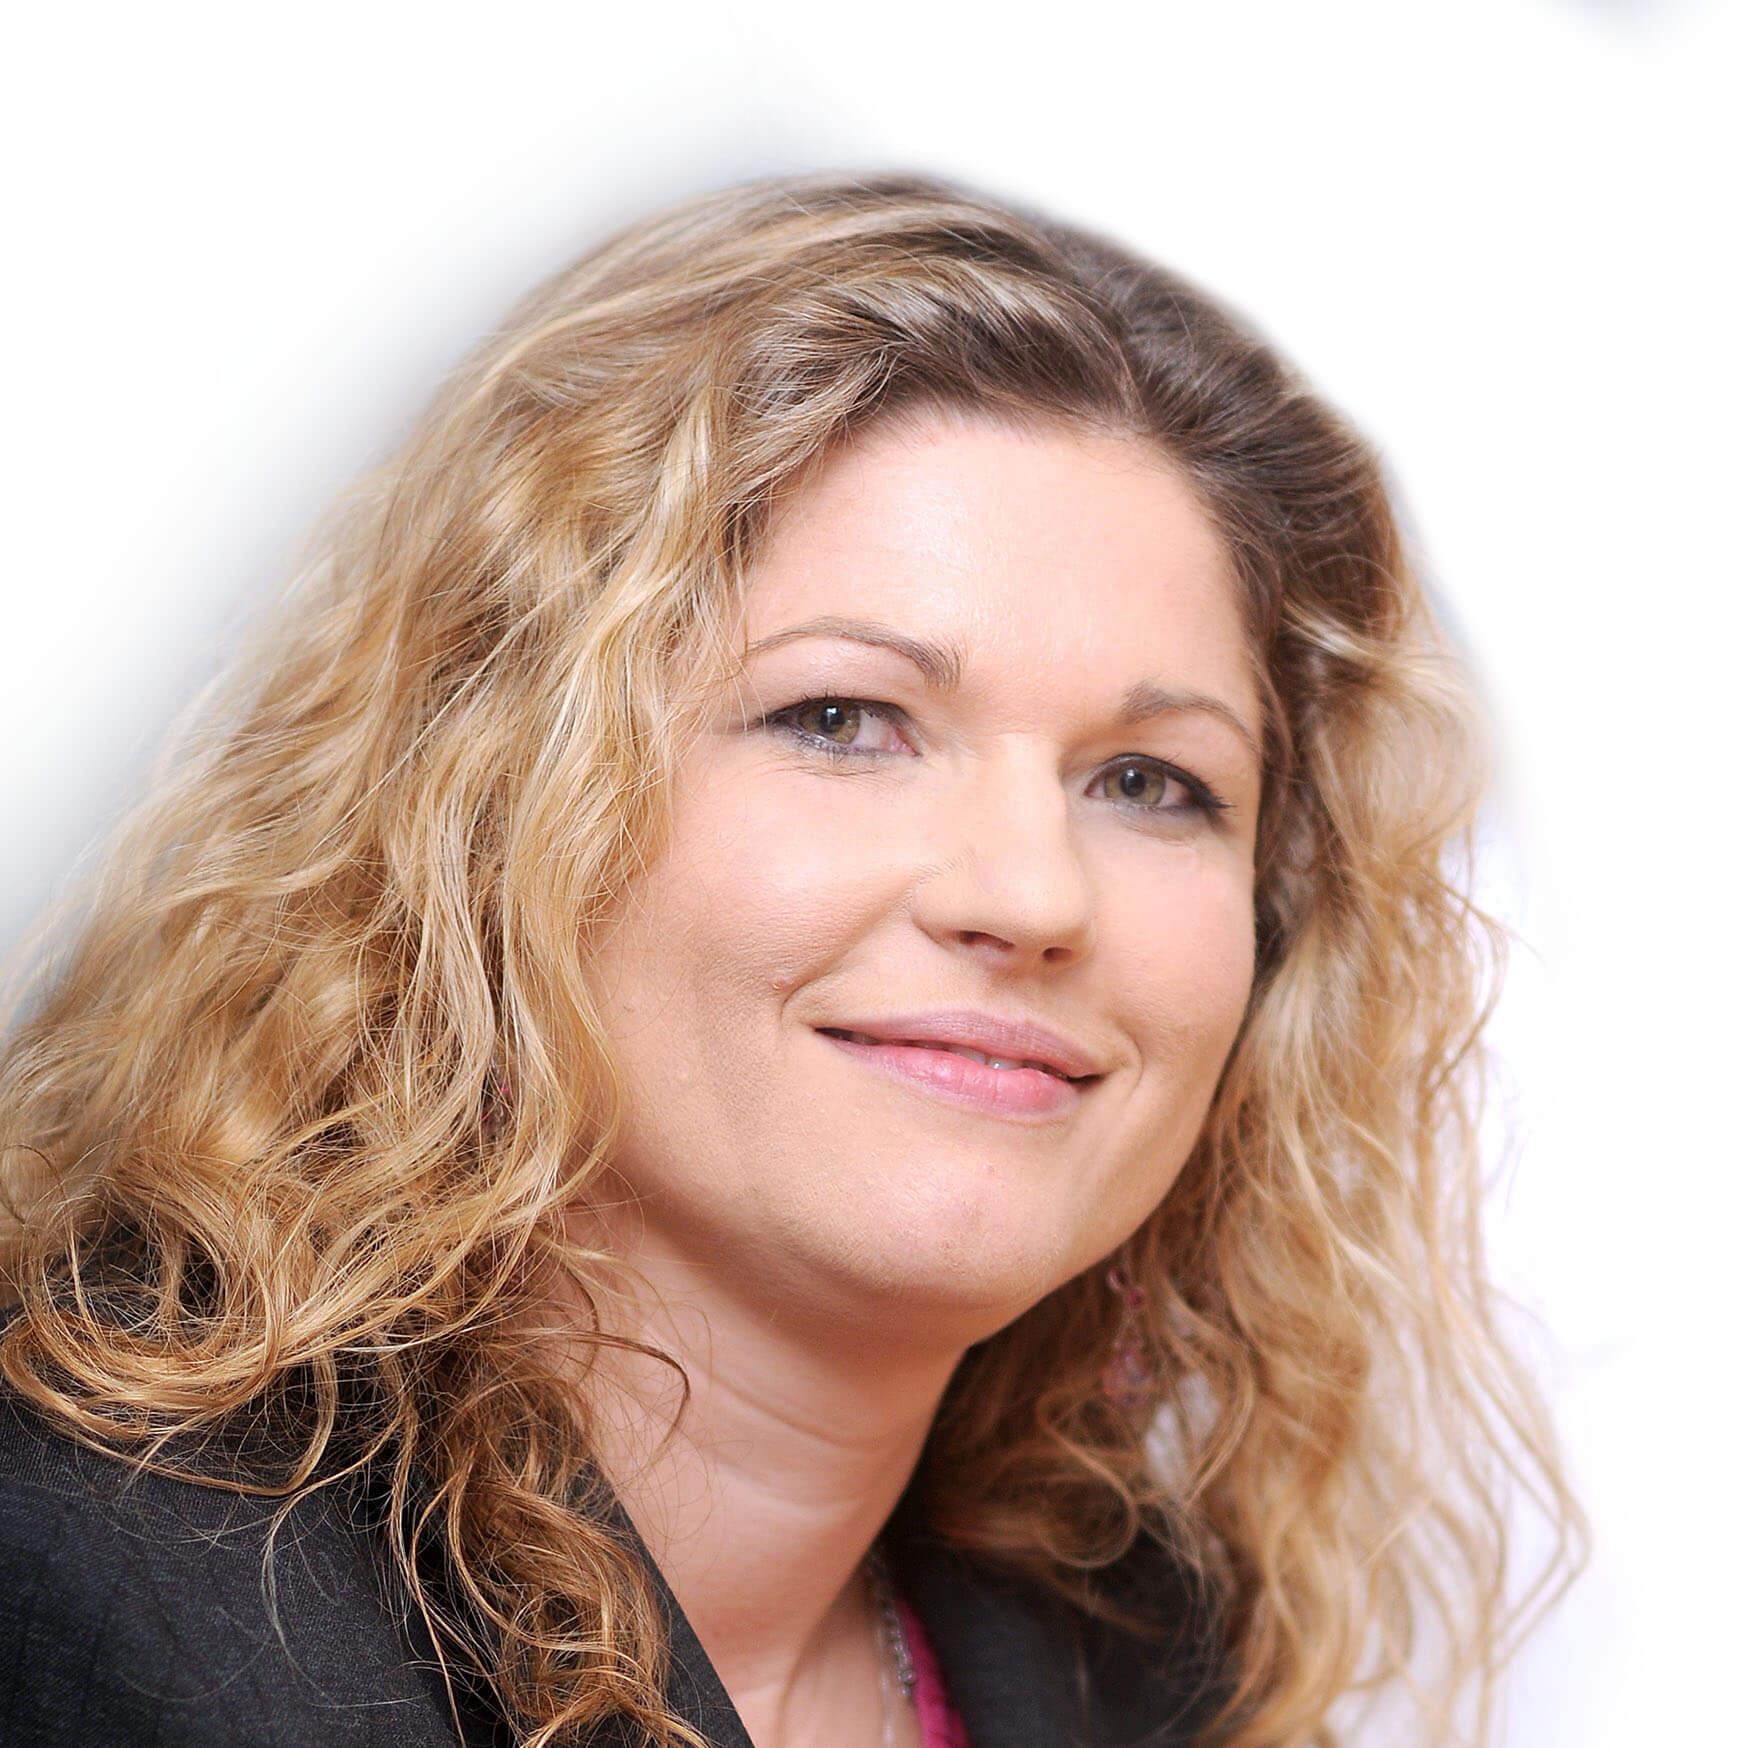 Rachel Credidio